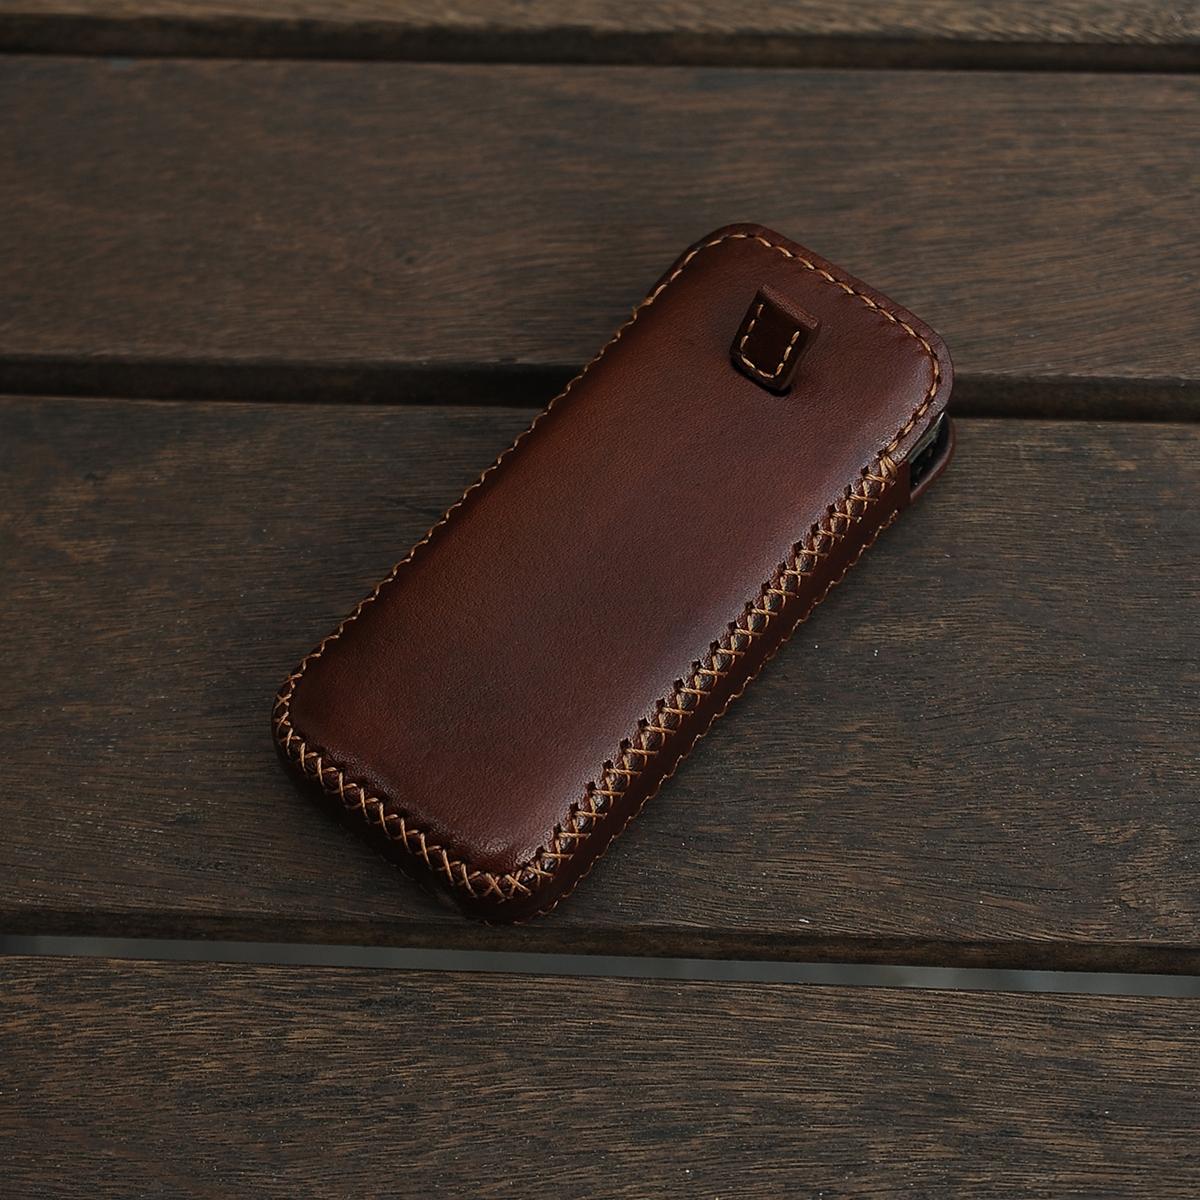 Bao da Nokia 8800 đeo hông - Bao điện thoại handmade da thật - Màu Nâu